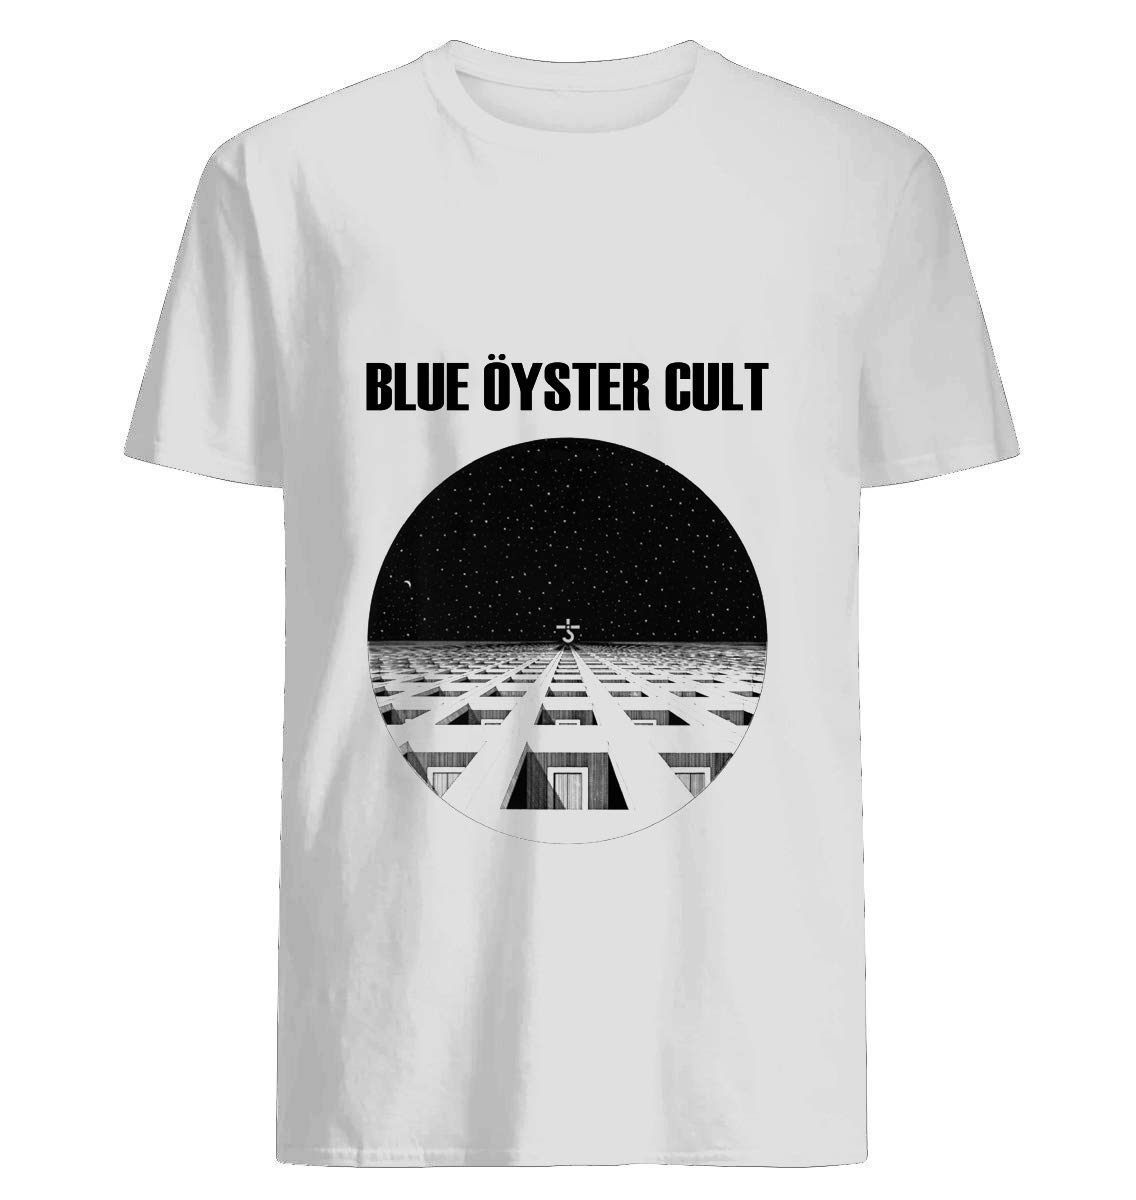 Blue Oyster Cult Tour 2016 18 T Shirt For Unisex